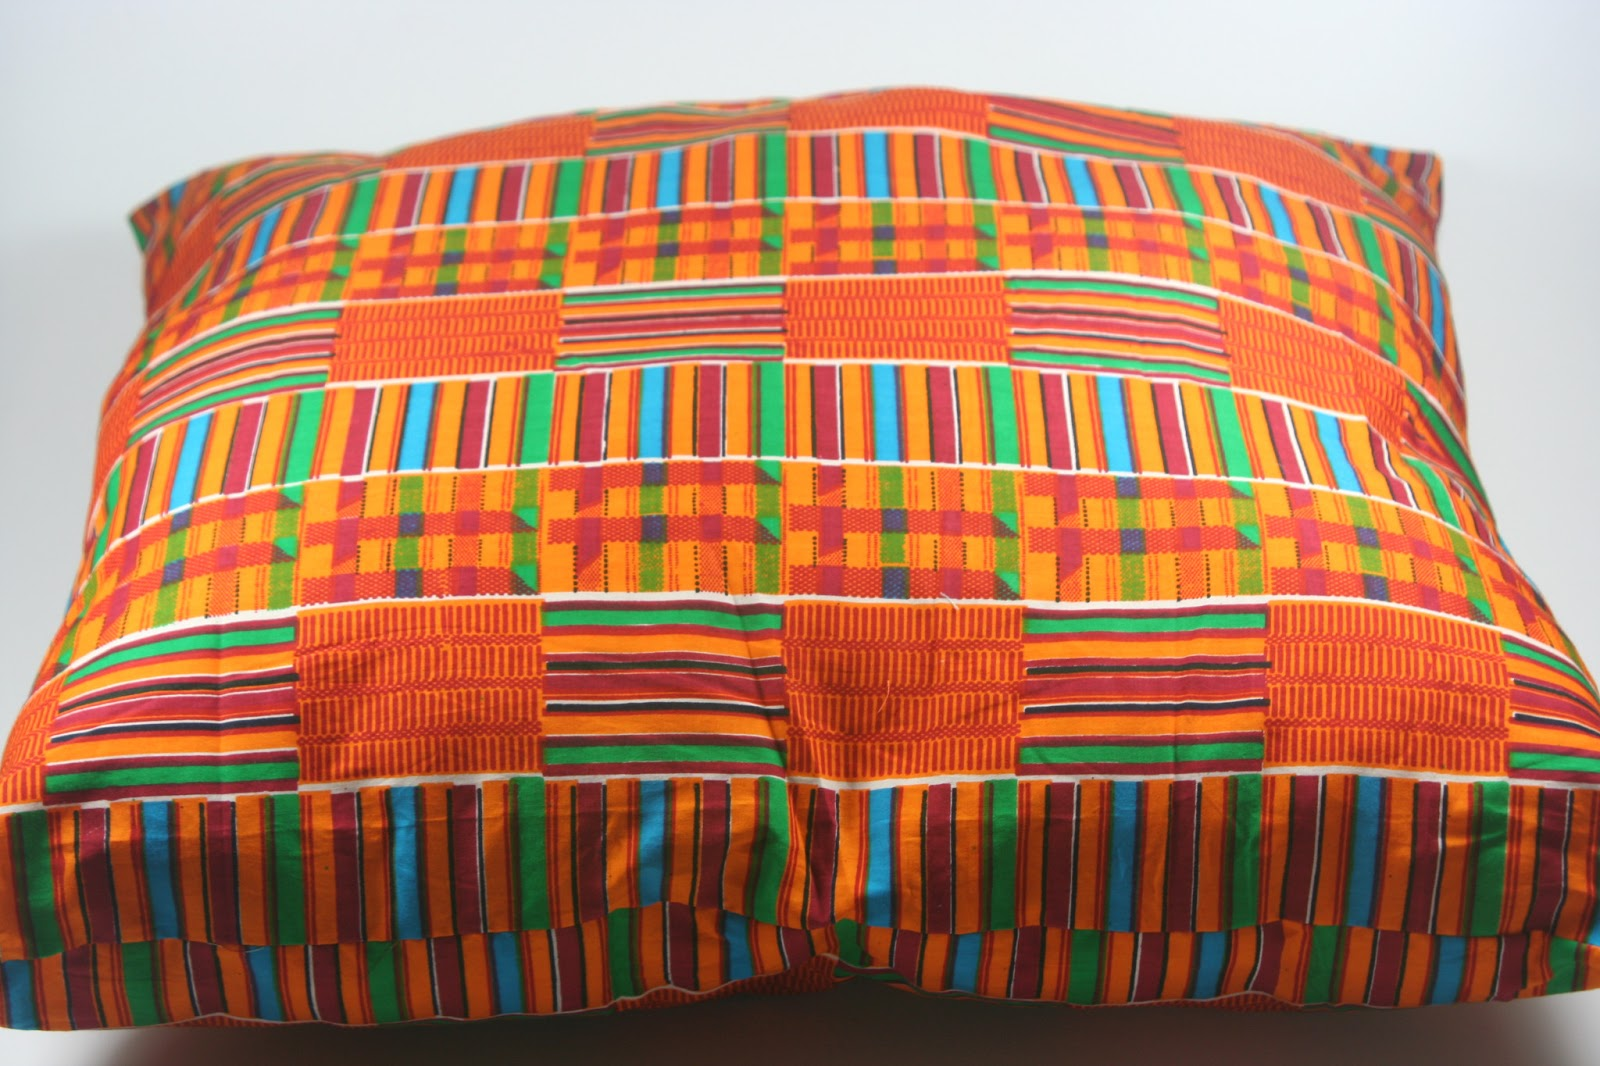 lapausa die farben afrikas. Black Bedroom Furniture Sets. Home Design Ideas